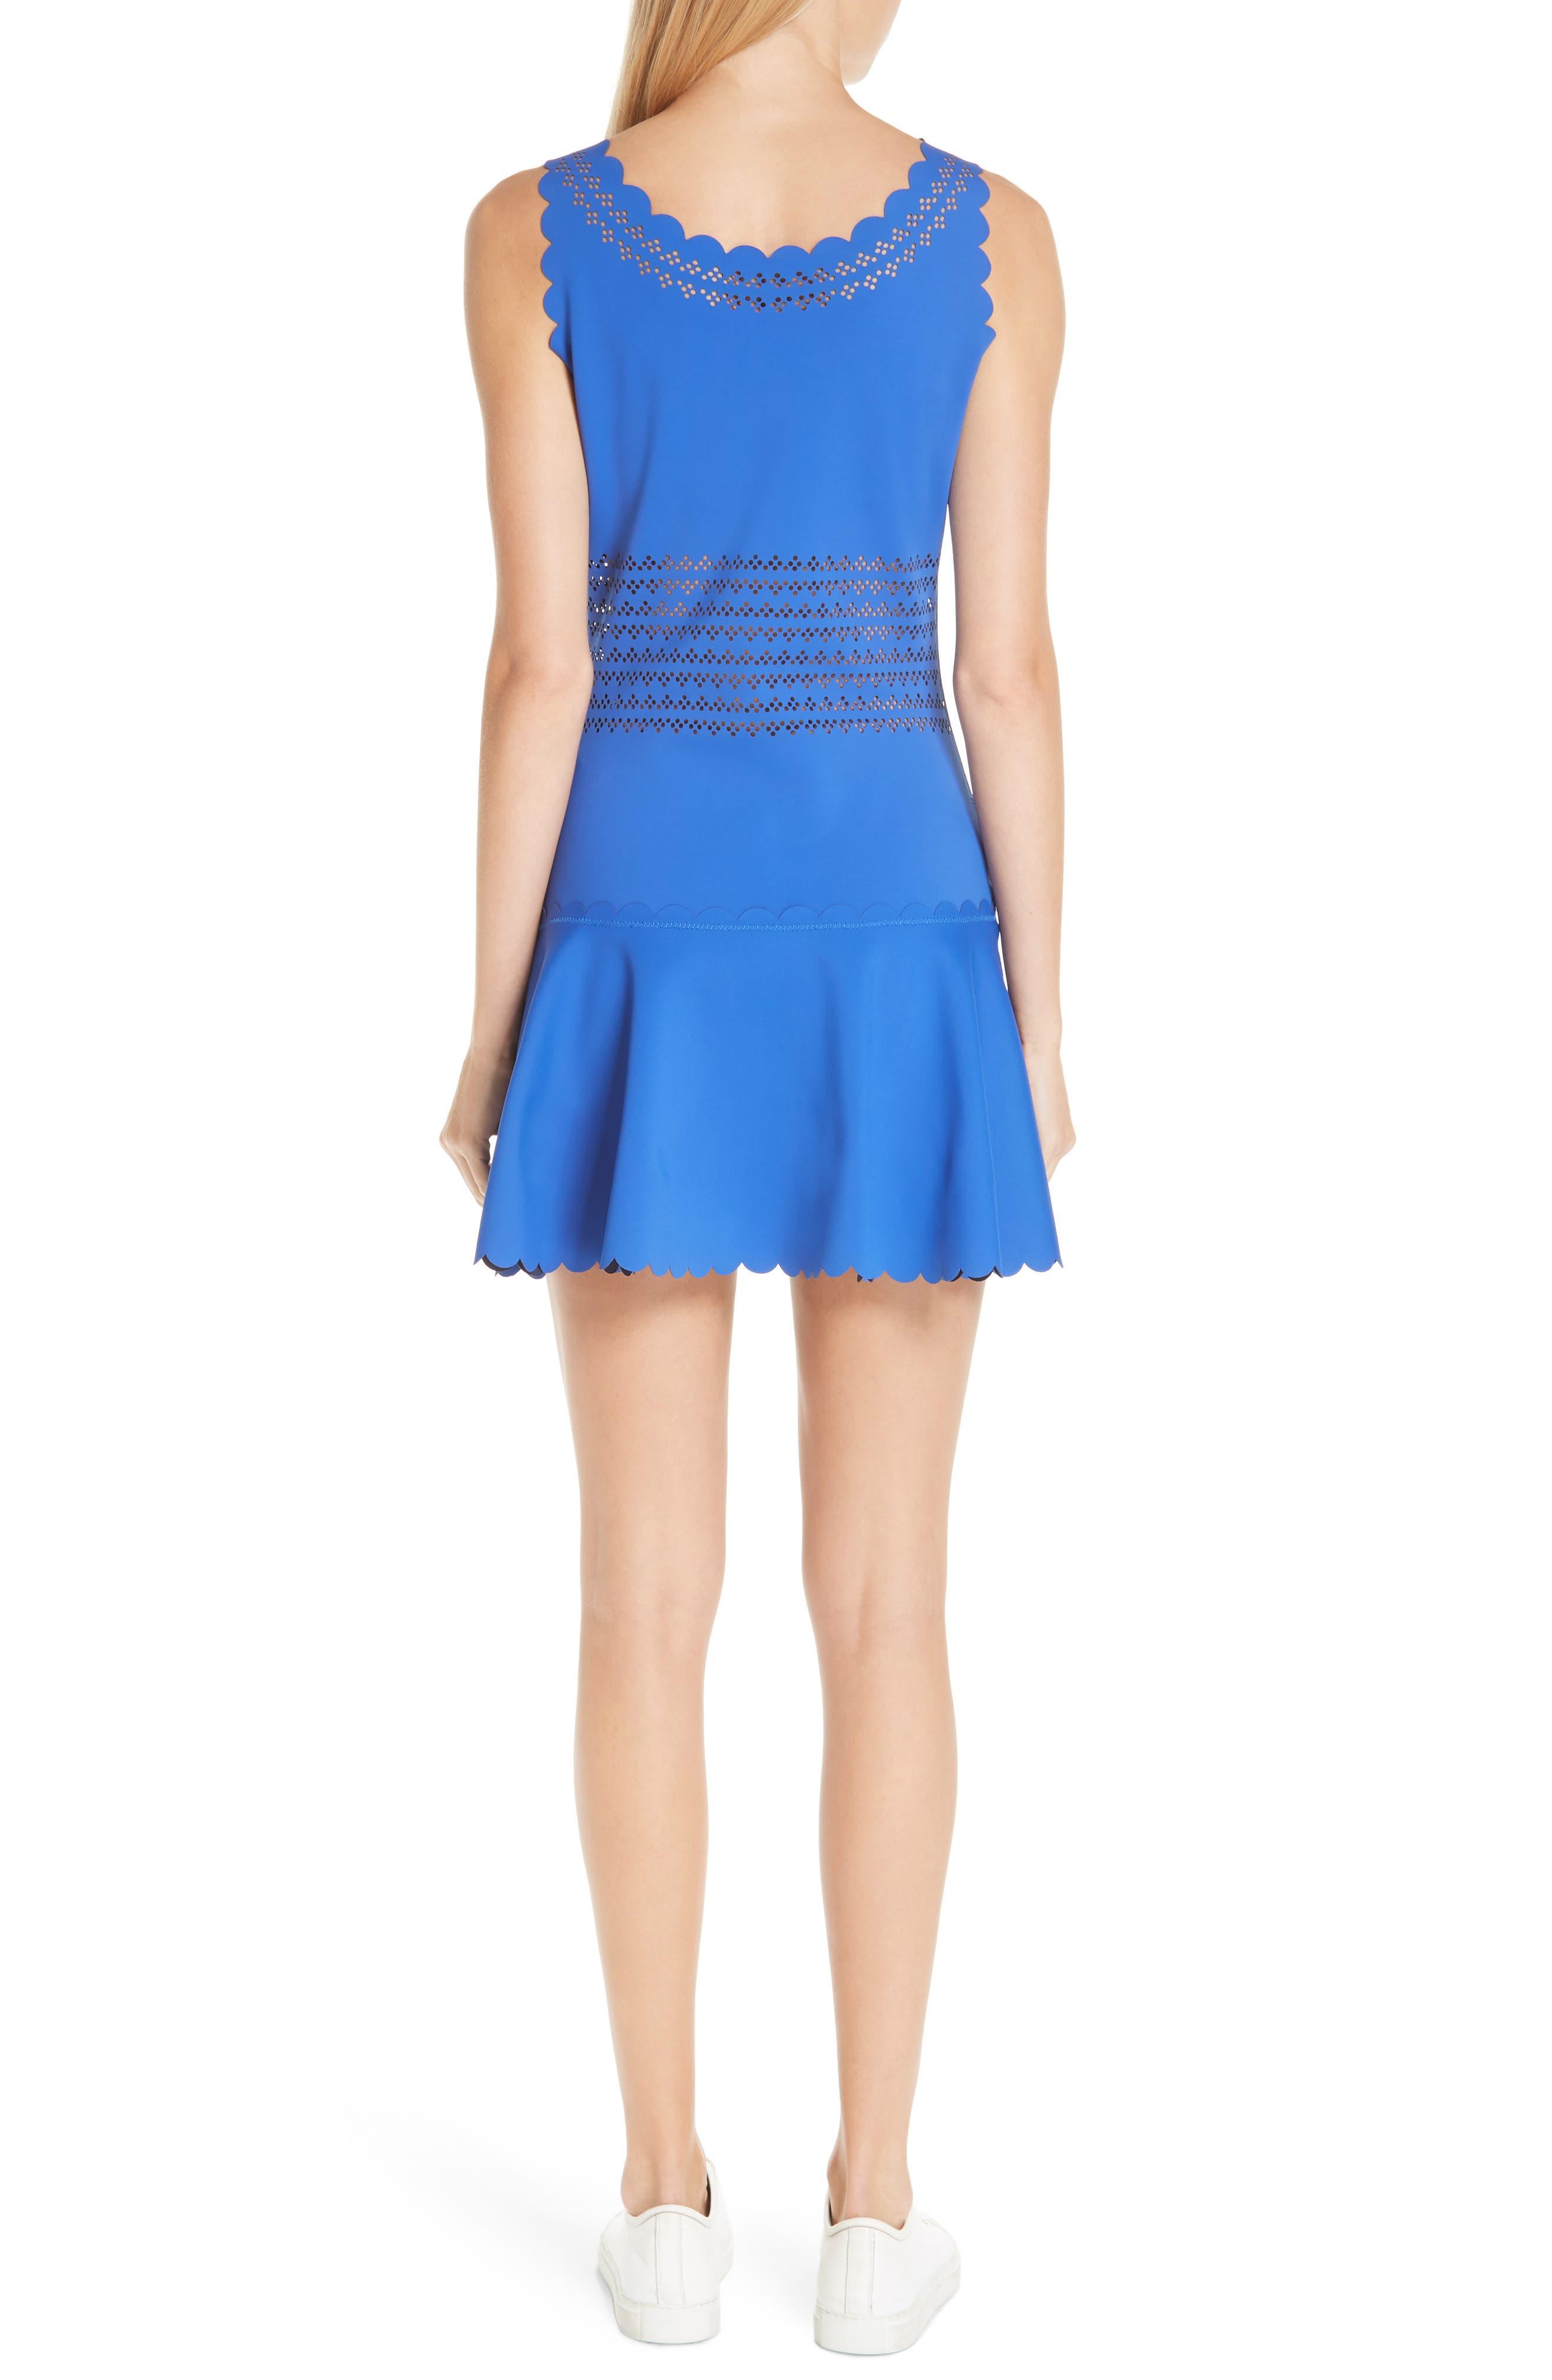 Center Court Tennis Dress,                             Alternate thumbnail 2, color,                             BLUE